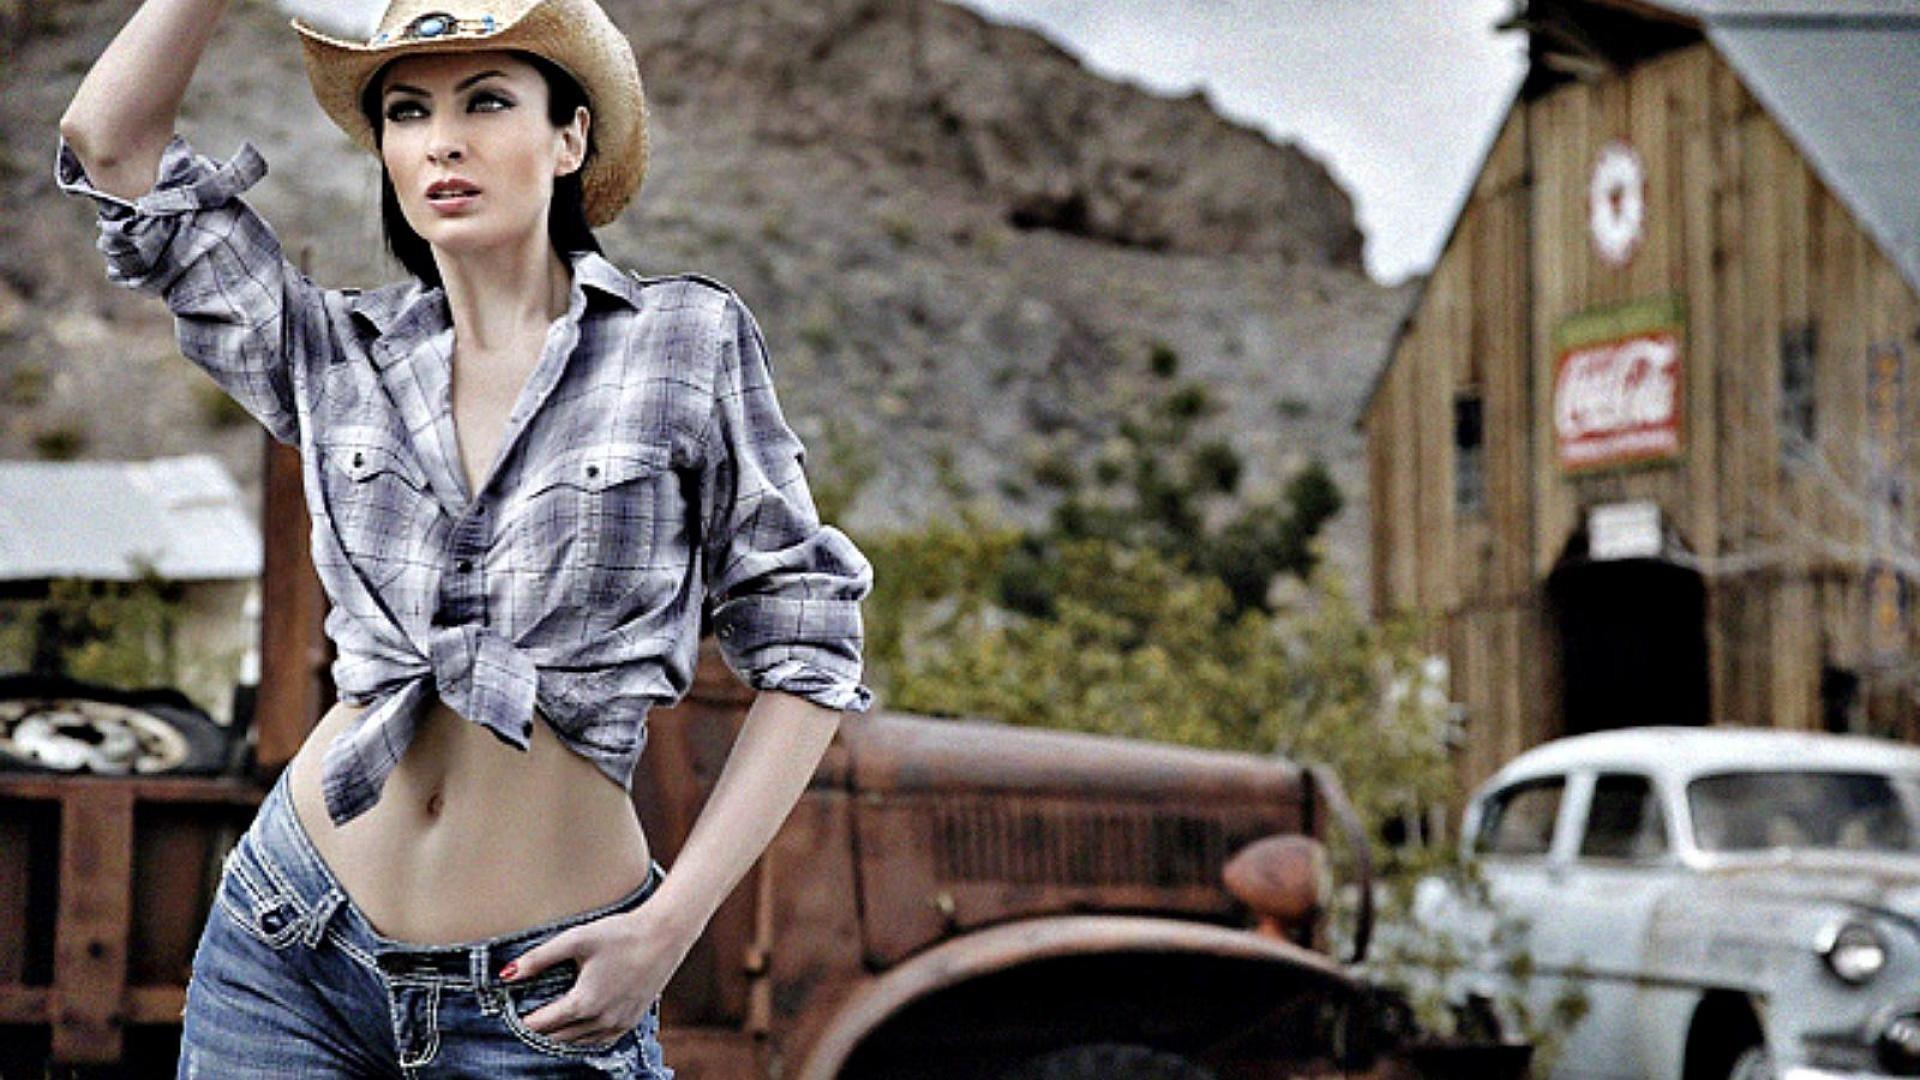 Country Girl Full HD Wallpaper